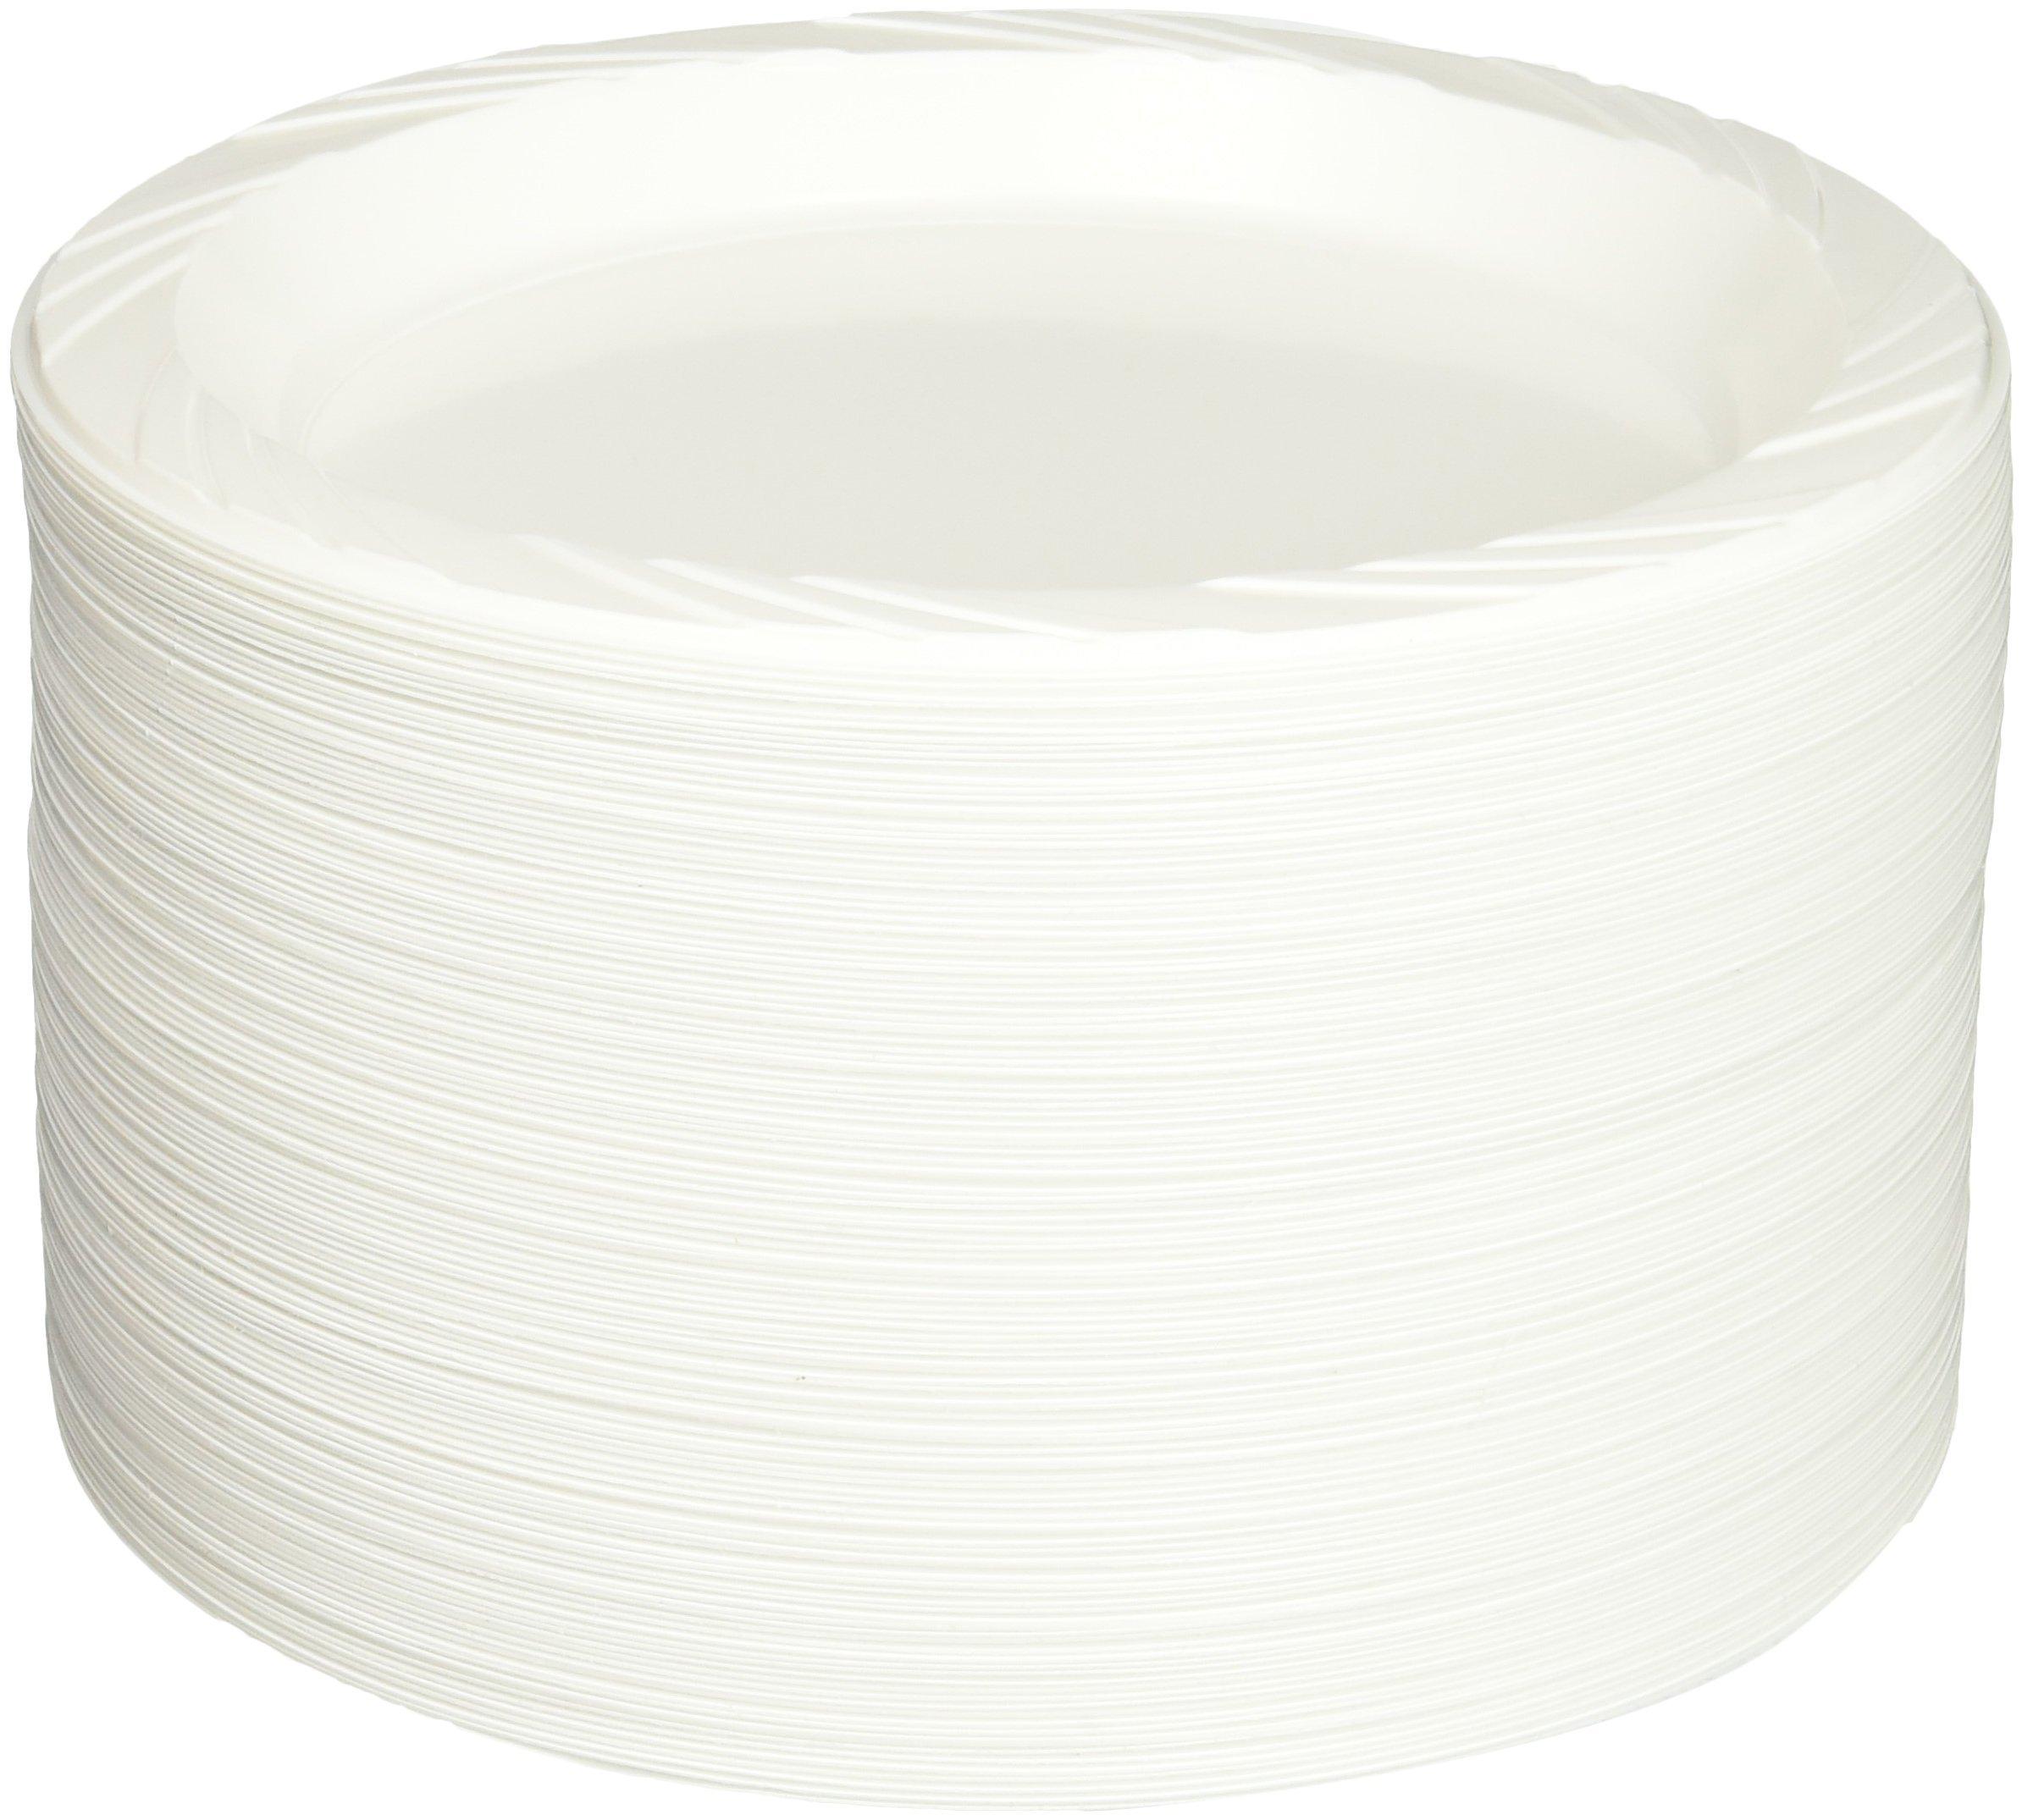 Genuine Joe GJO10329 Plastic Reusable/Disposable Plate, 9'' Diameter, White (Pack of 125)